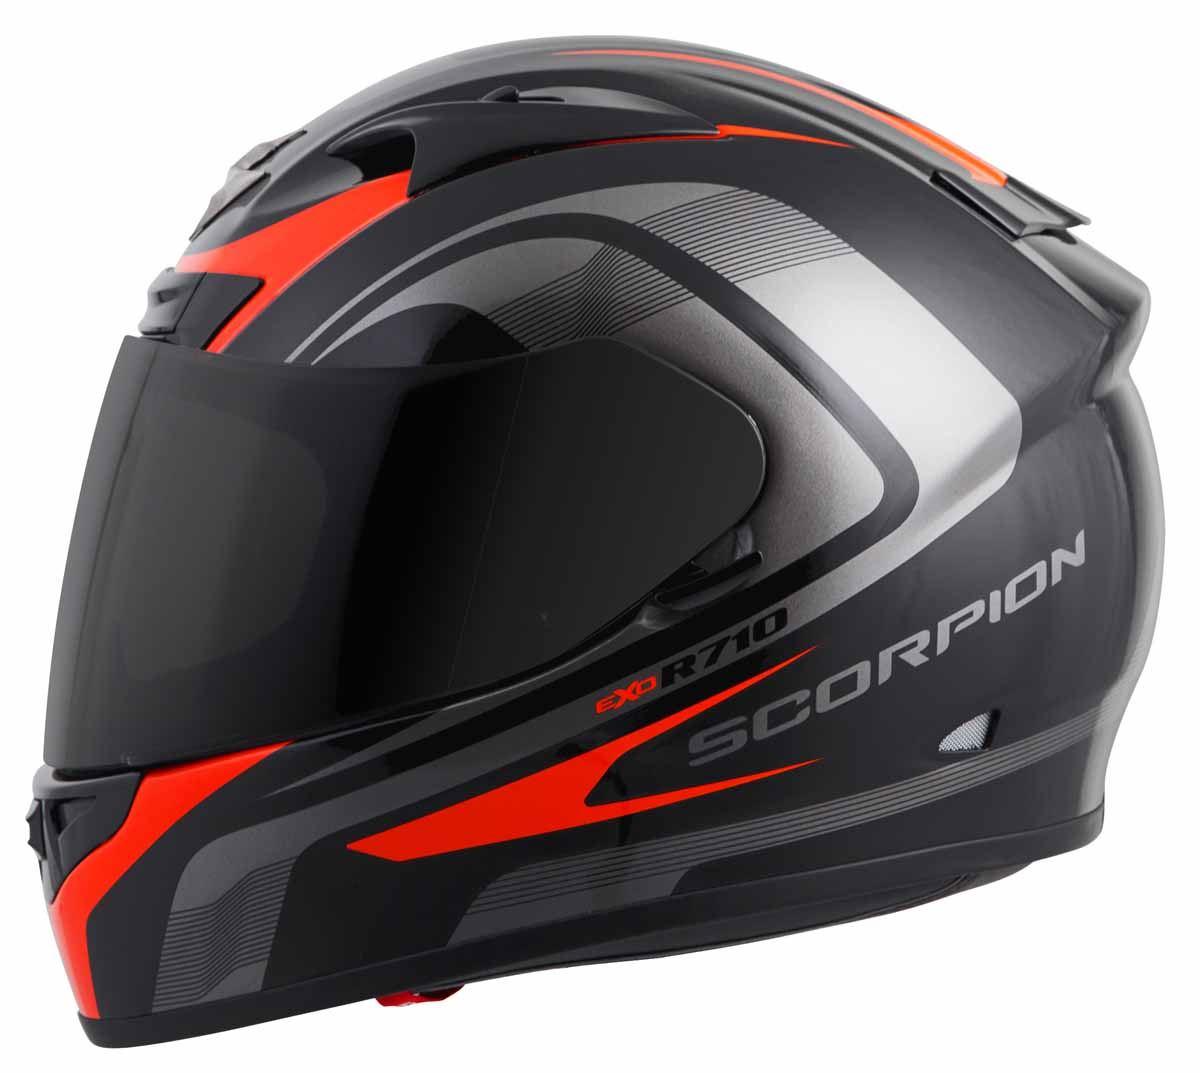 Scorpion-EXO-R710-Helmet-Fiberglass-Full-Face-DOT-SNELL-M2015-Certified-XS-2XL miniature 12